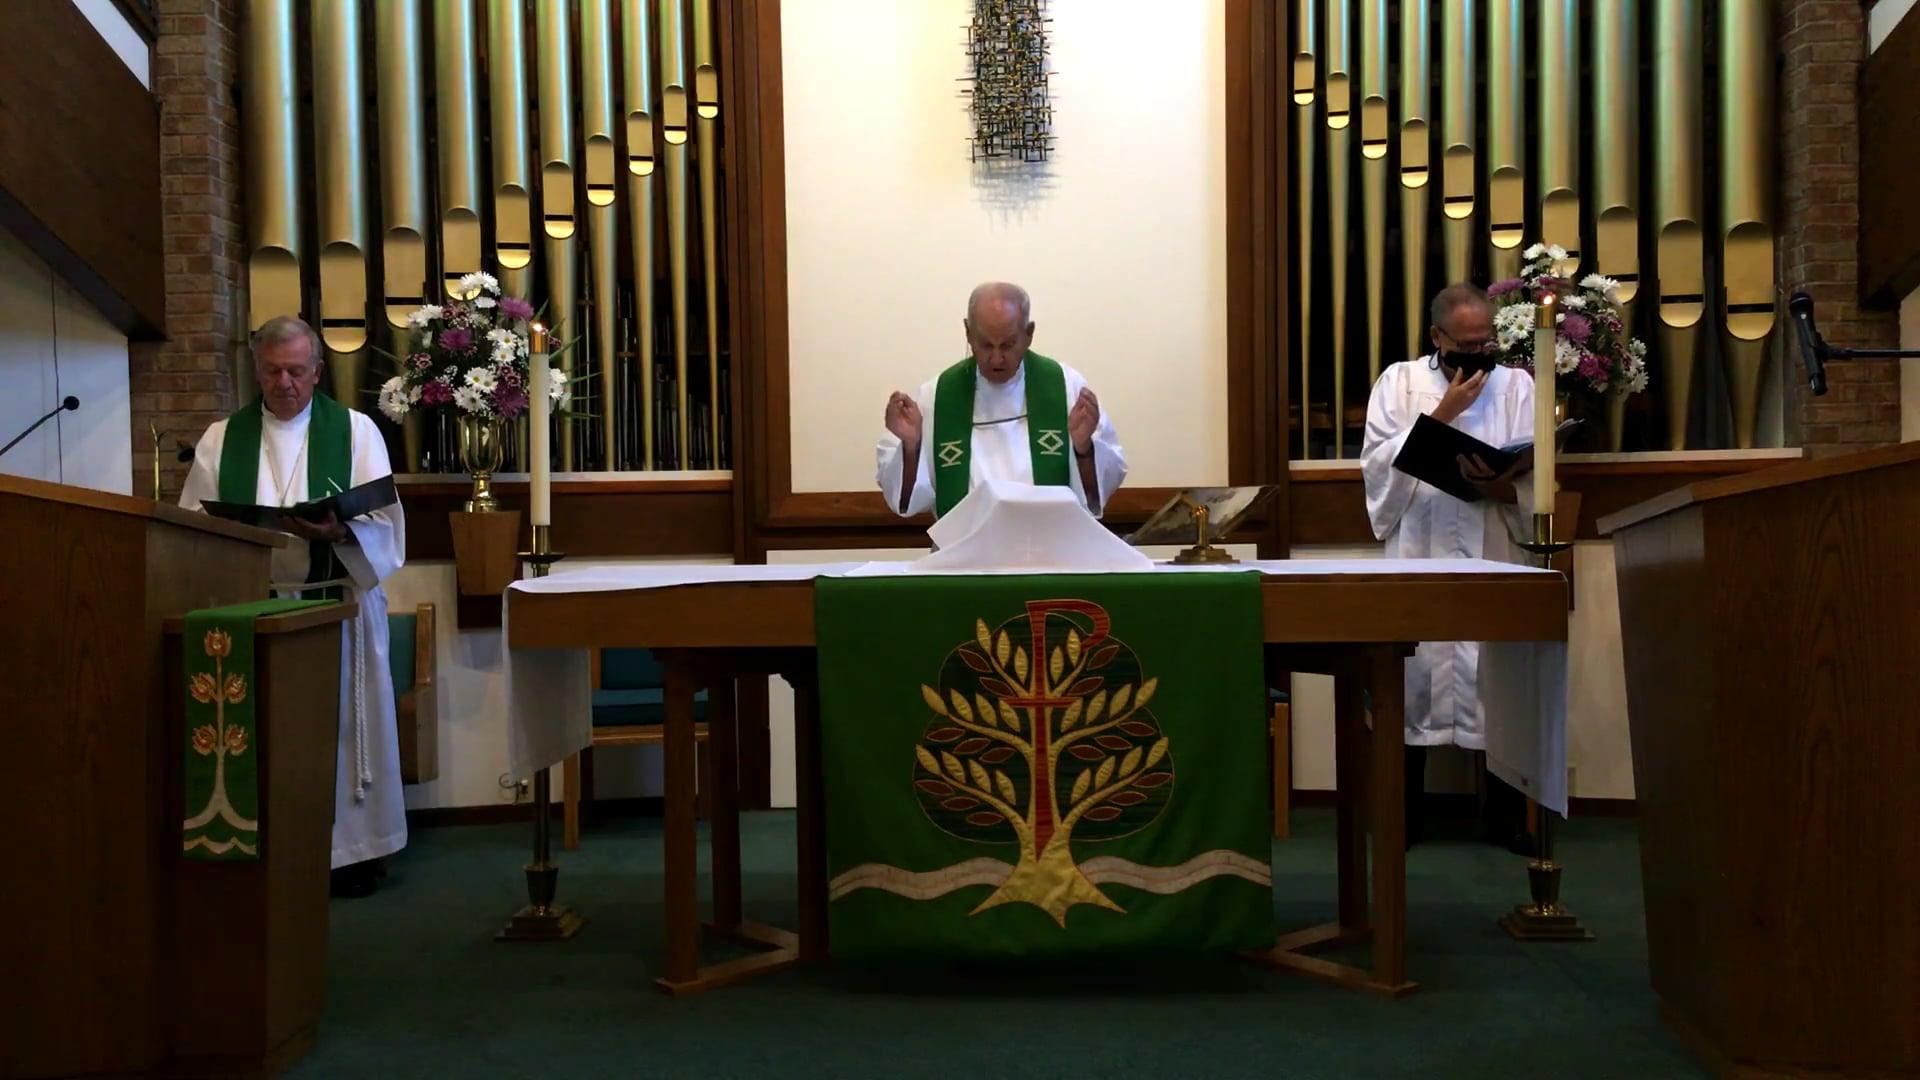 FLC Worship Service - August 22, 2021